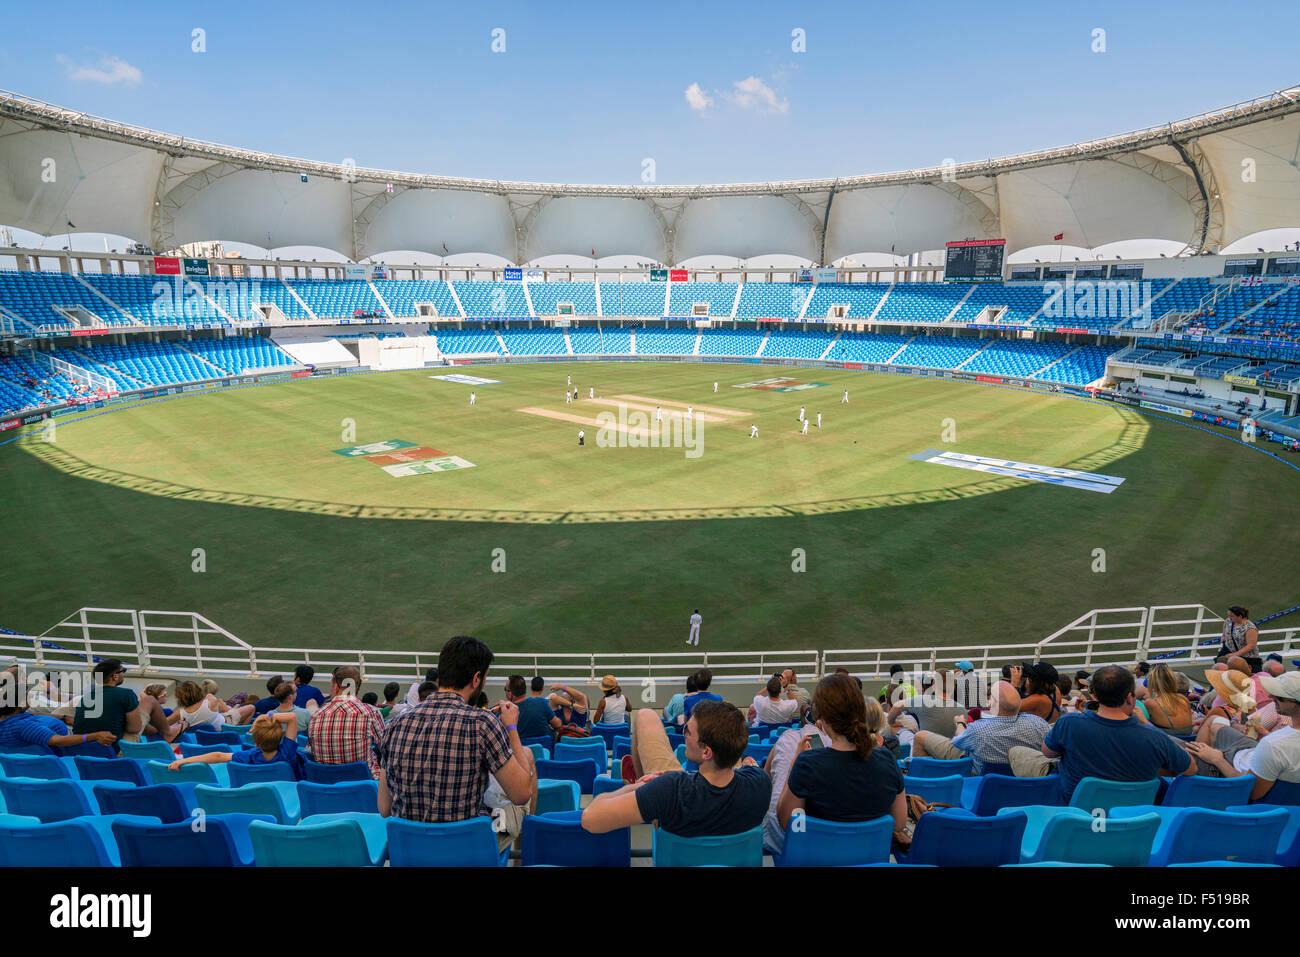 Cricket Test Match btwn England and Pakistan in October 2015 at Dubai International Cricket Stadium Dubai United - Stock Image